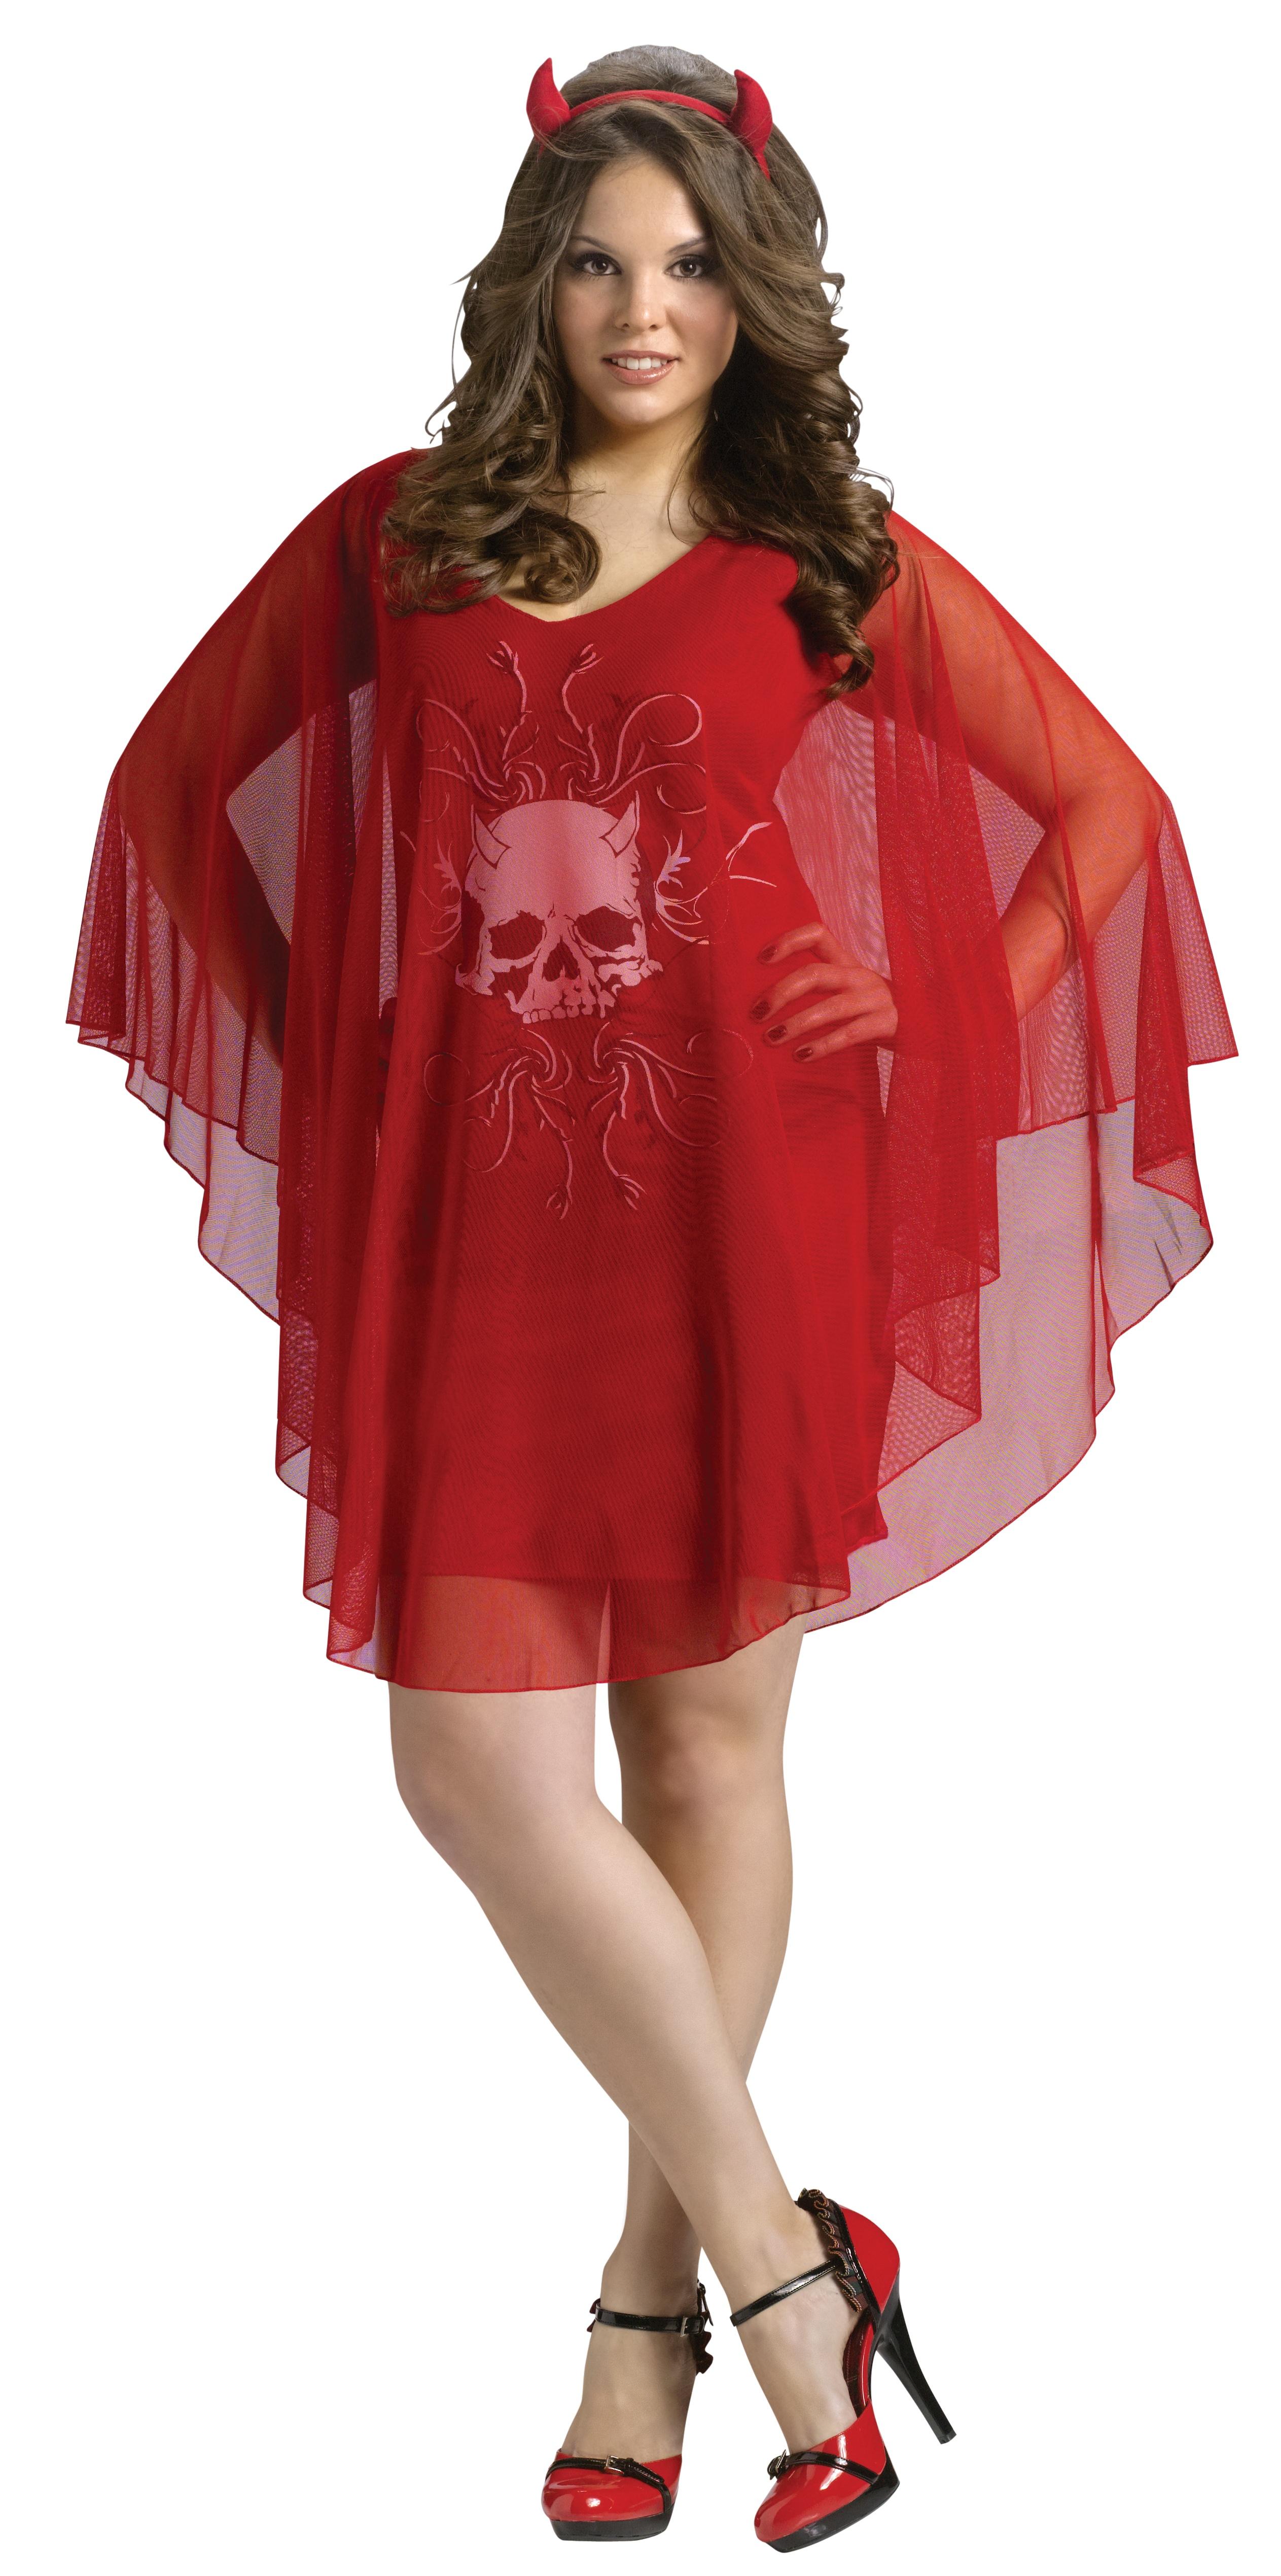 Womens devil costume 119975 Brazilian Models 61 item Actor list by 40 votes 13 comments